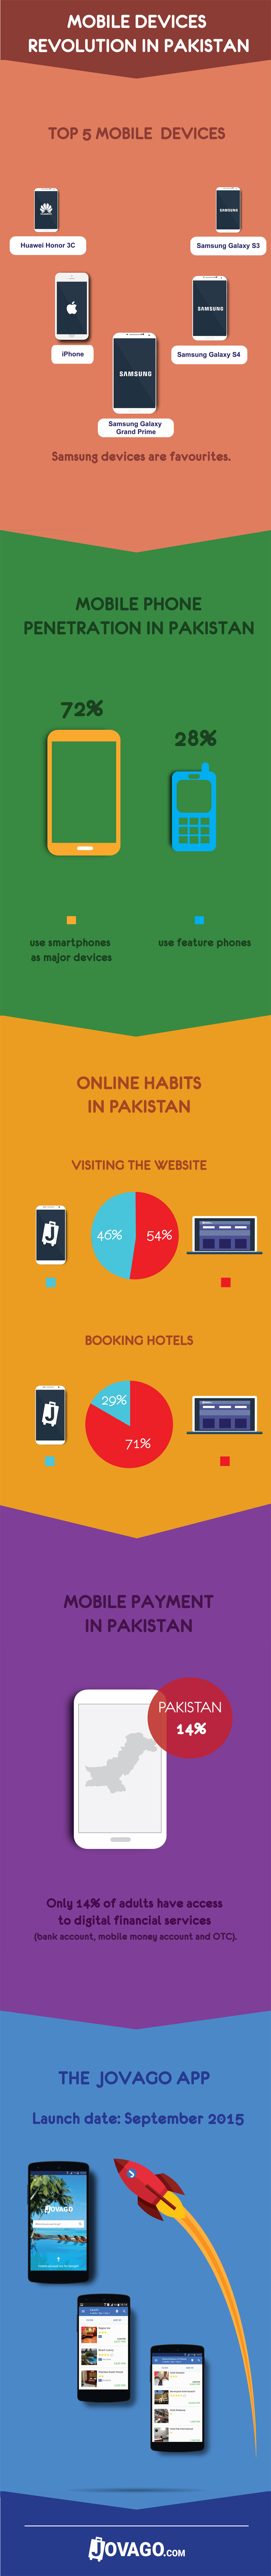 Infographic-Mobile-PK